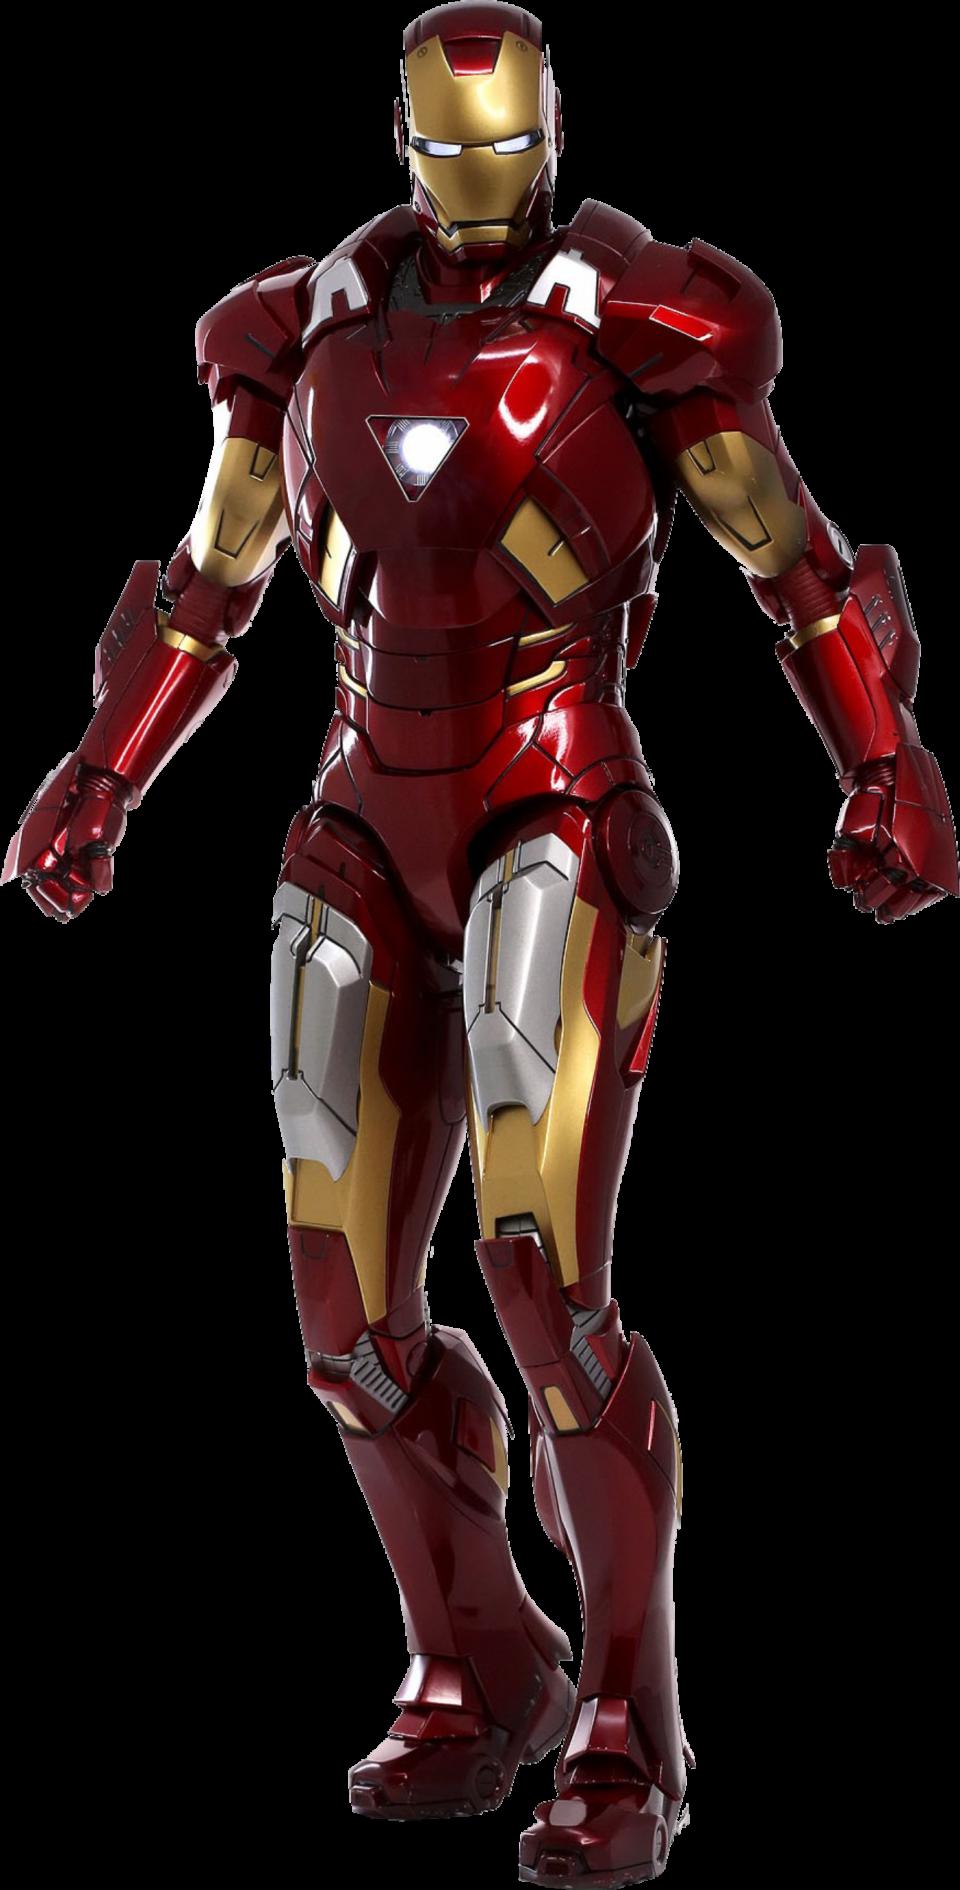 Ironman Tony Stark PNG Image